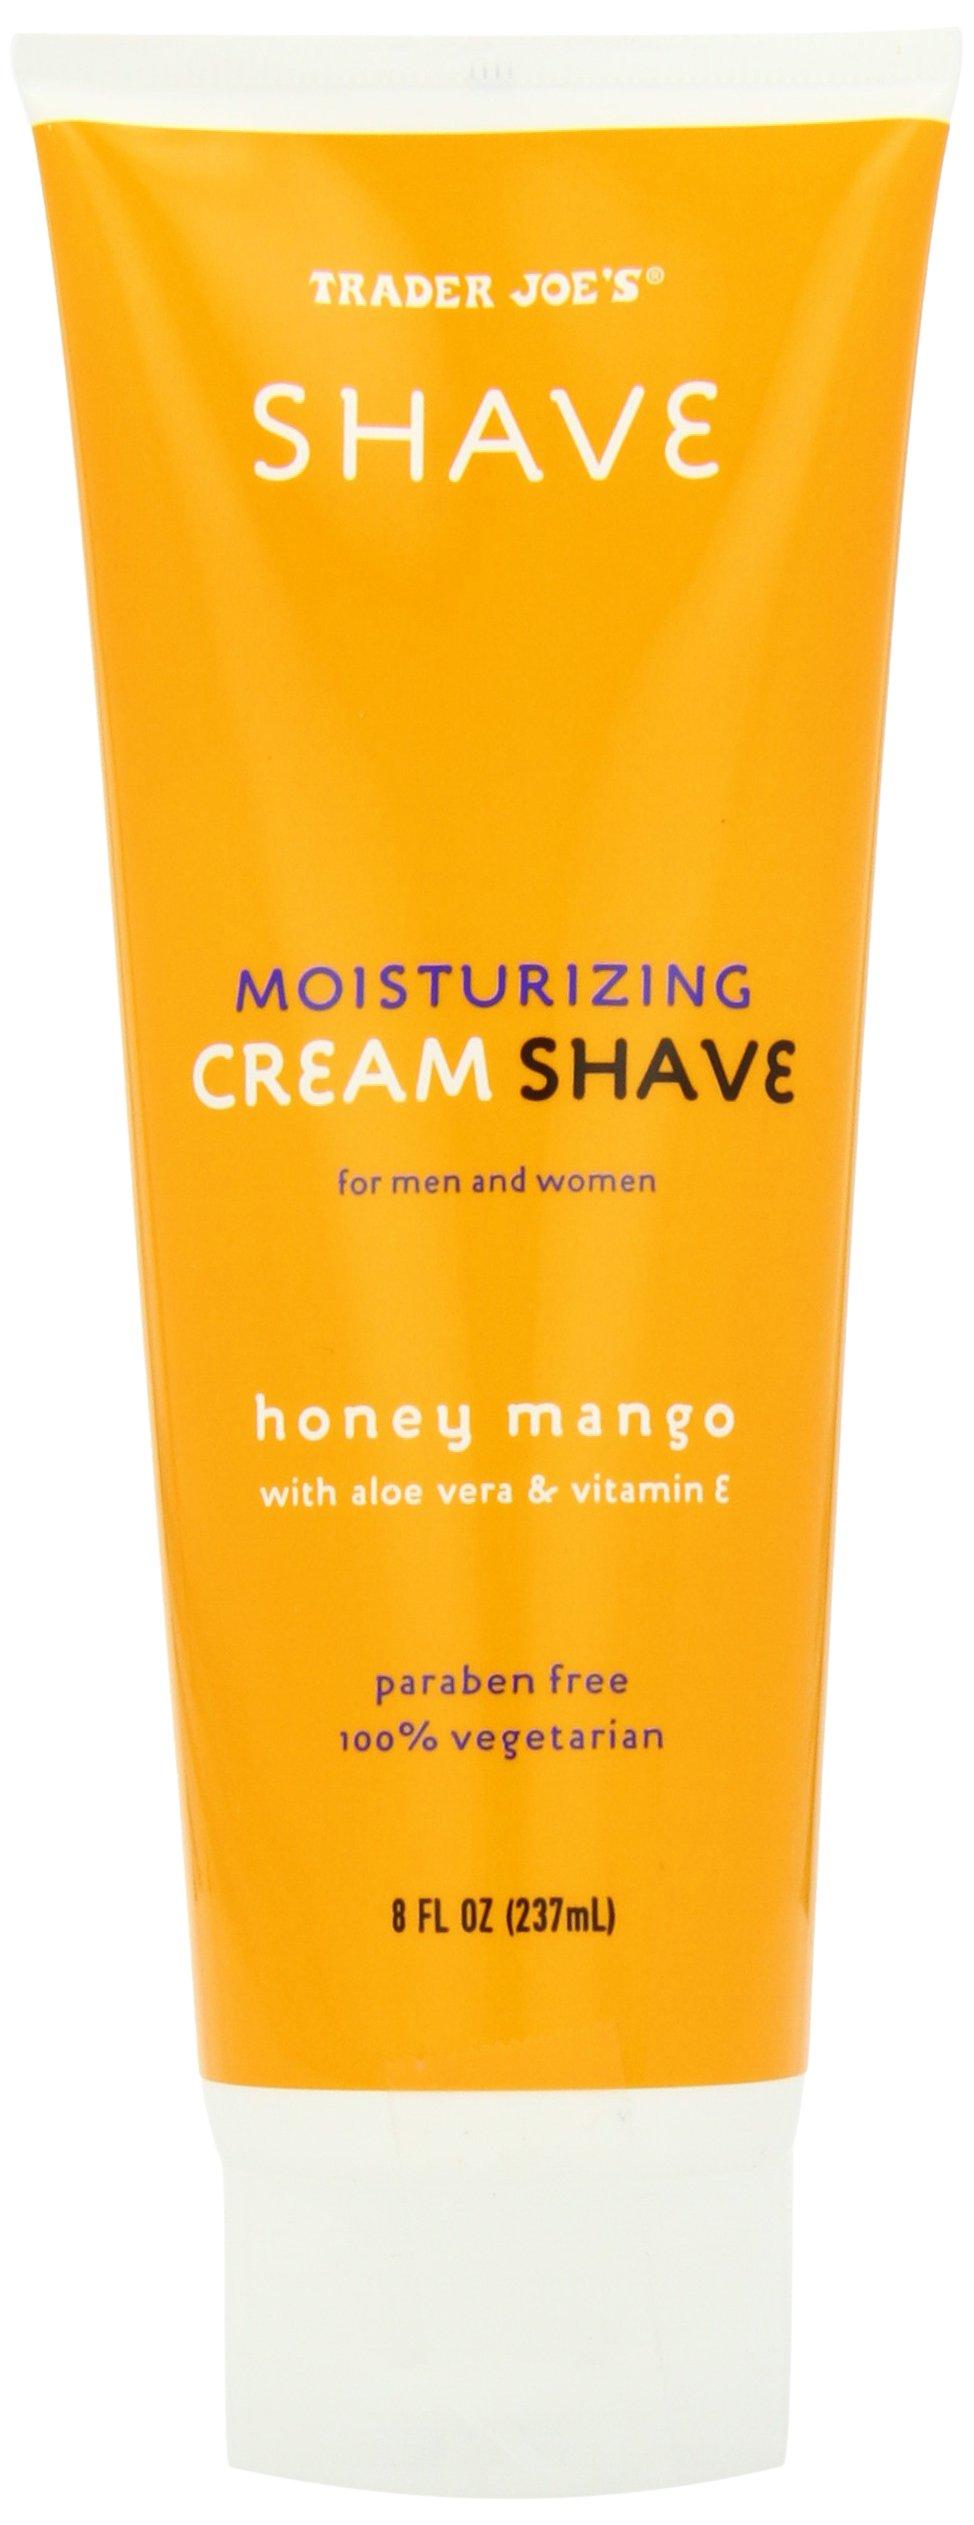 Trader Joe's - Moisturizing Cream Shave Honey Mango